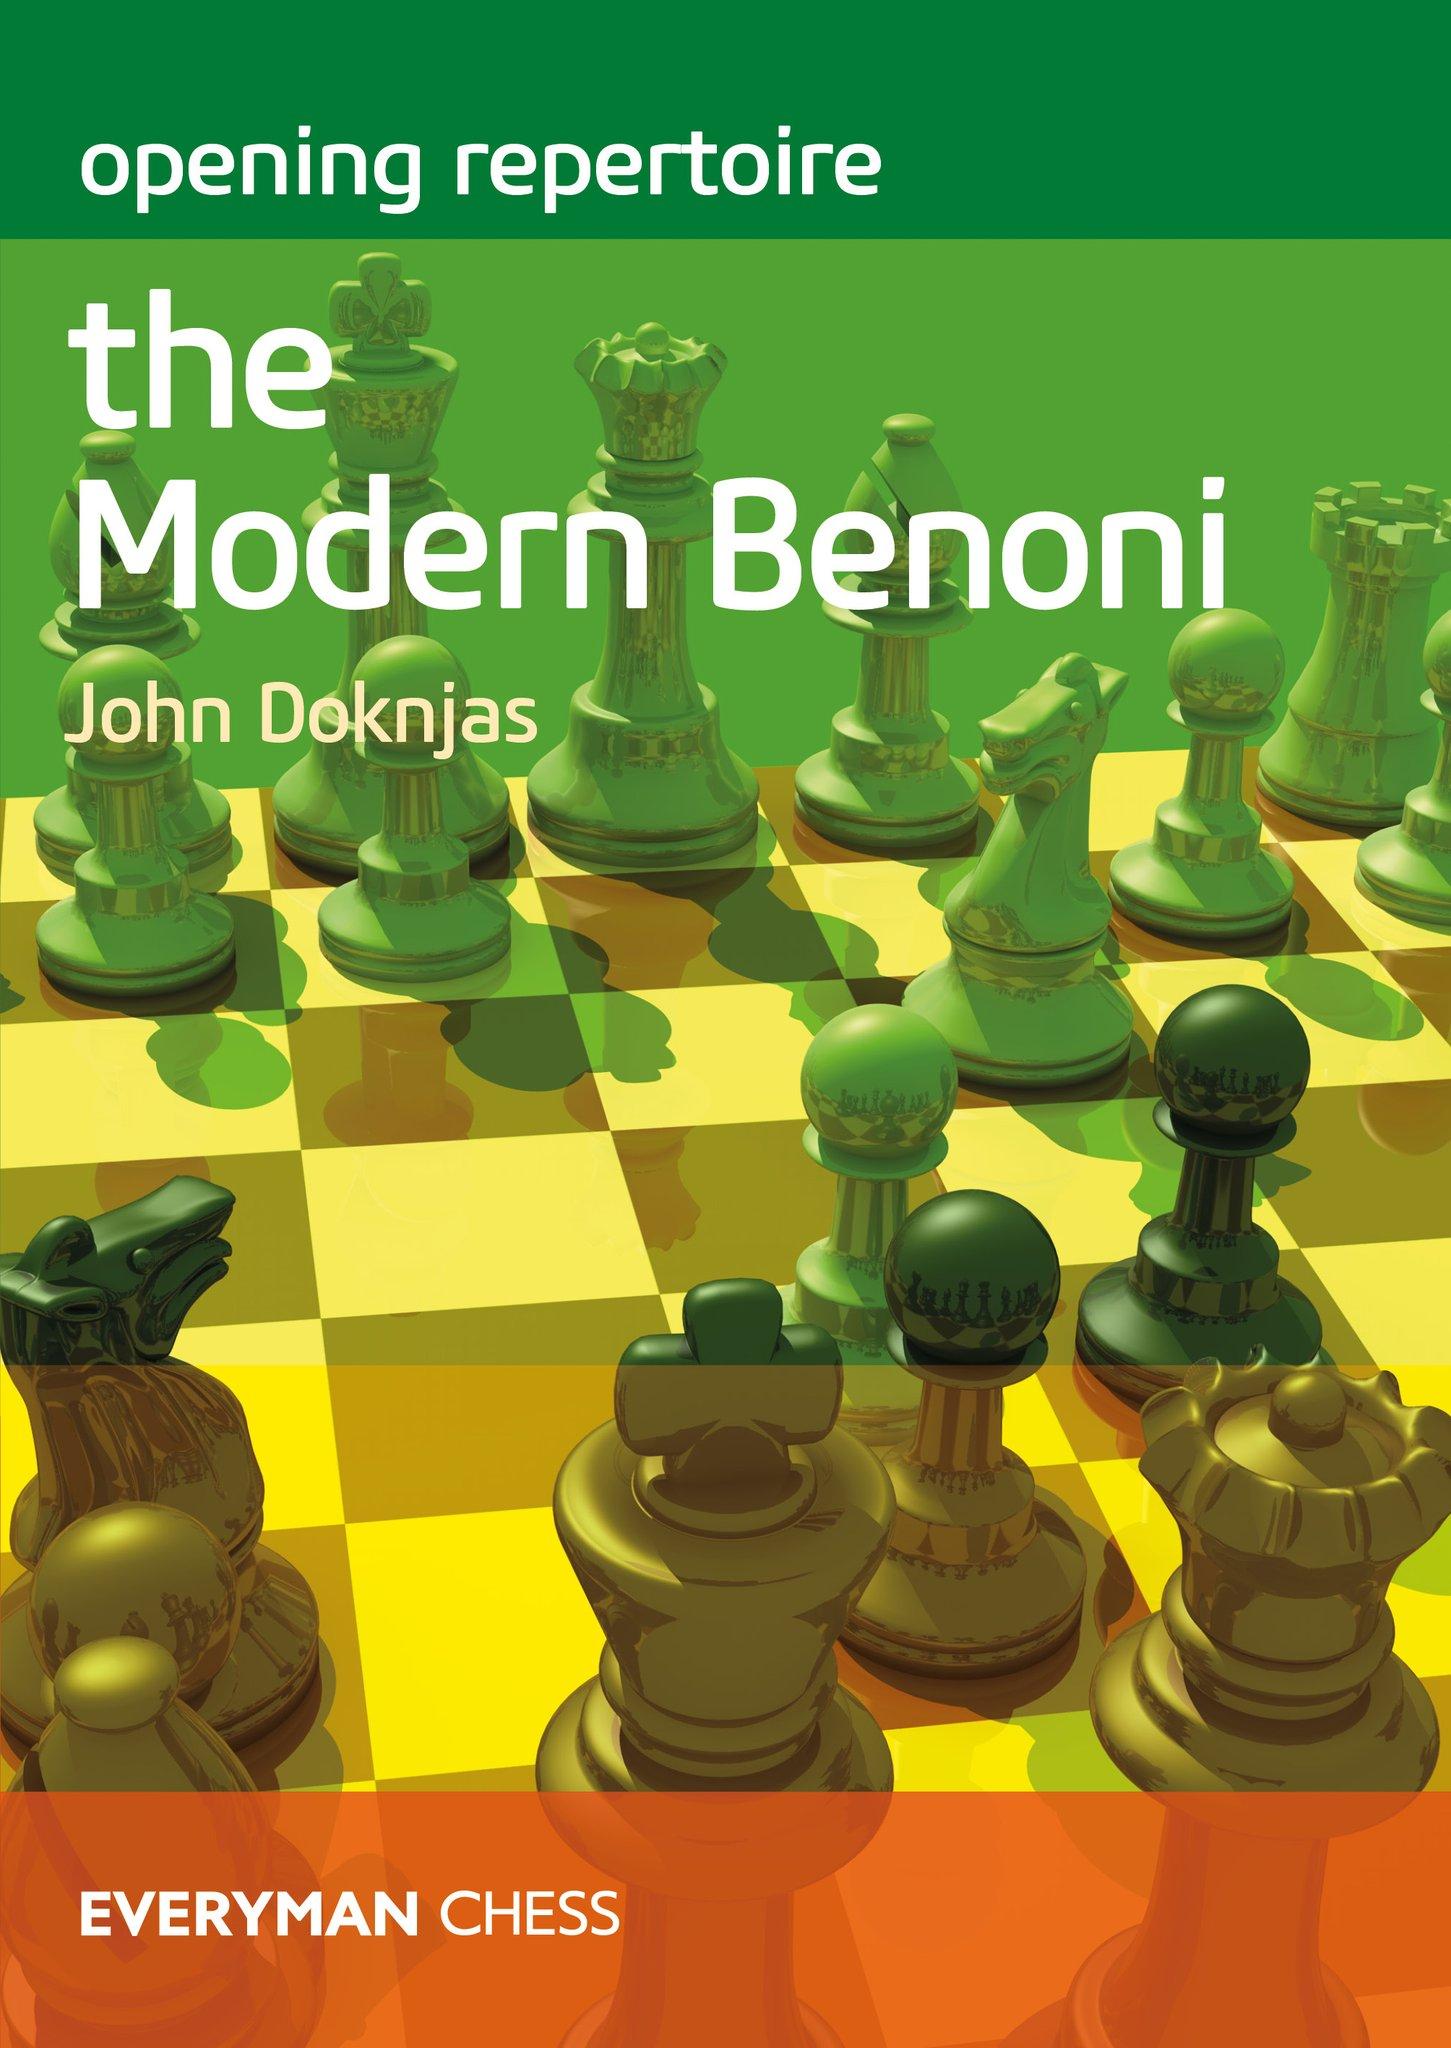 Opening Repertoire : The Modern Benoni